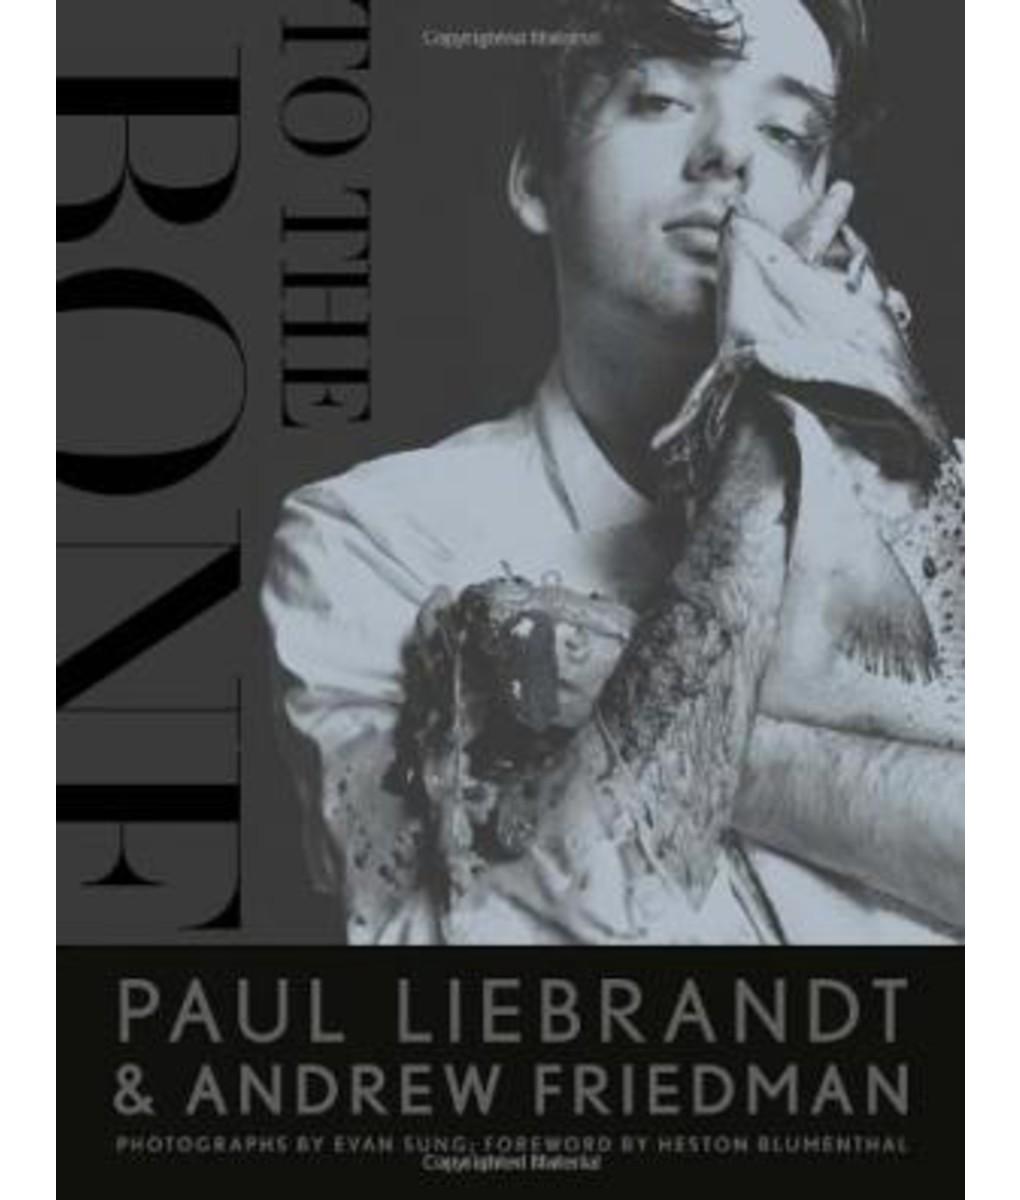 To The Bone - Paul Liebrandt & Andrew Friedman